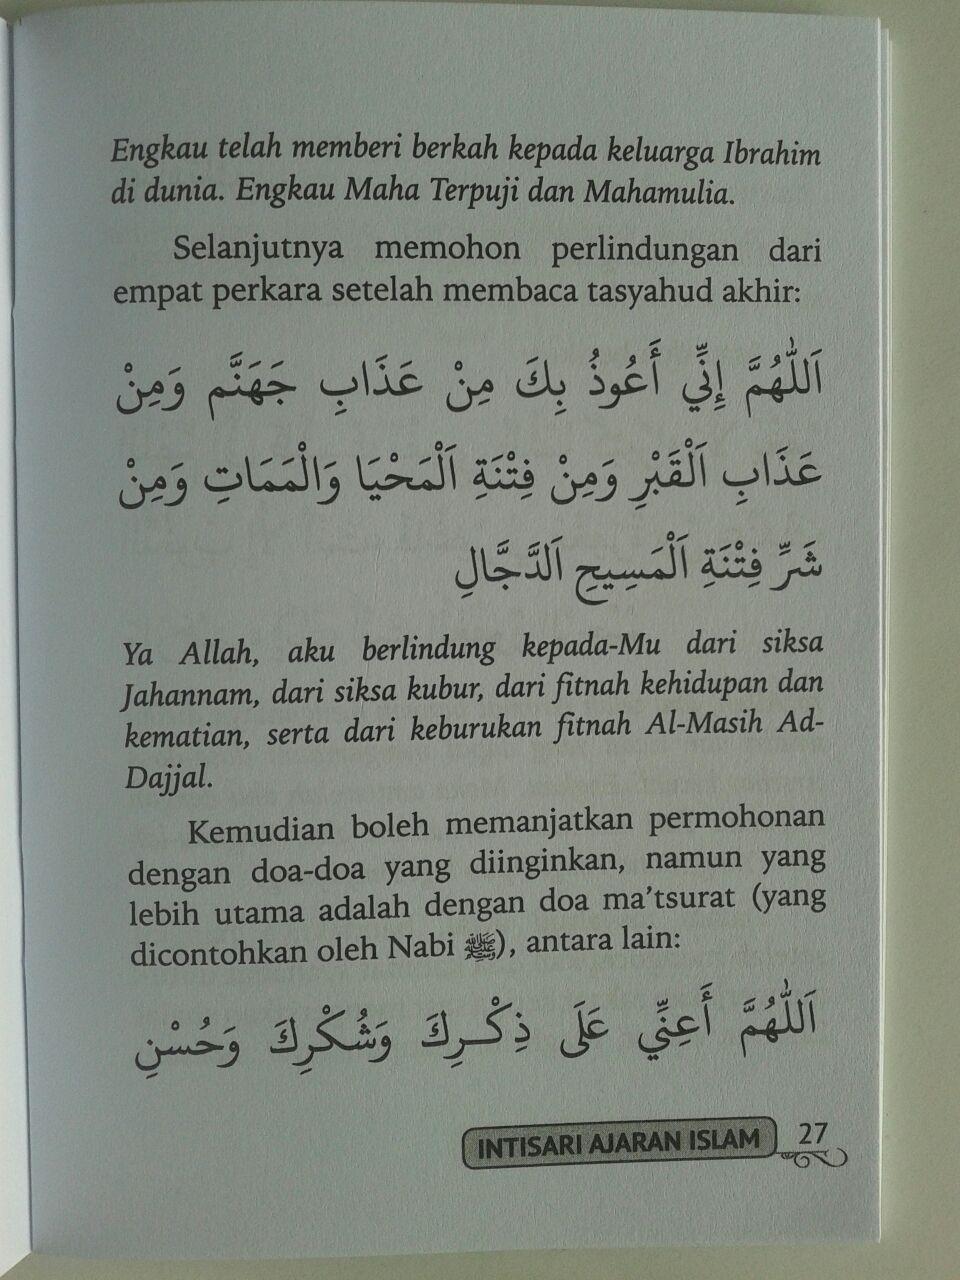 Buku Saku Intisari Ajaran Islam Pelajaran Penting Yang Harus Diketahui isi 3